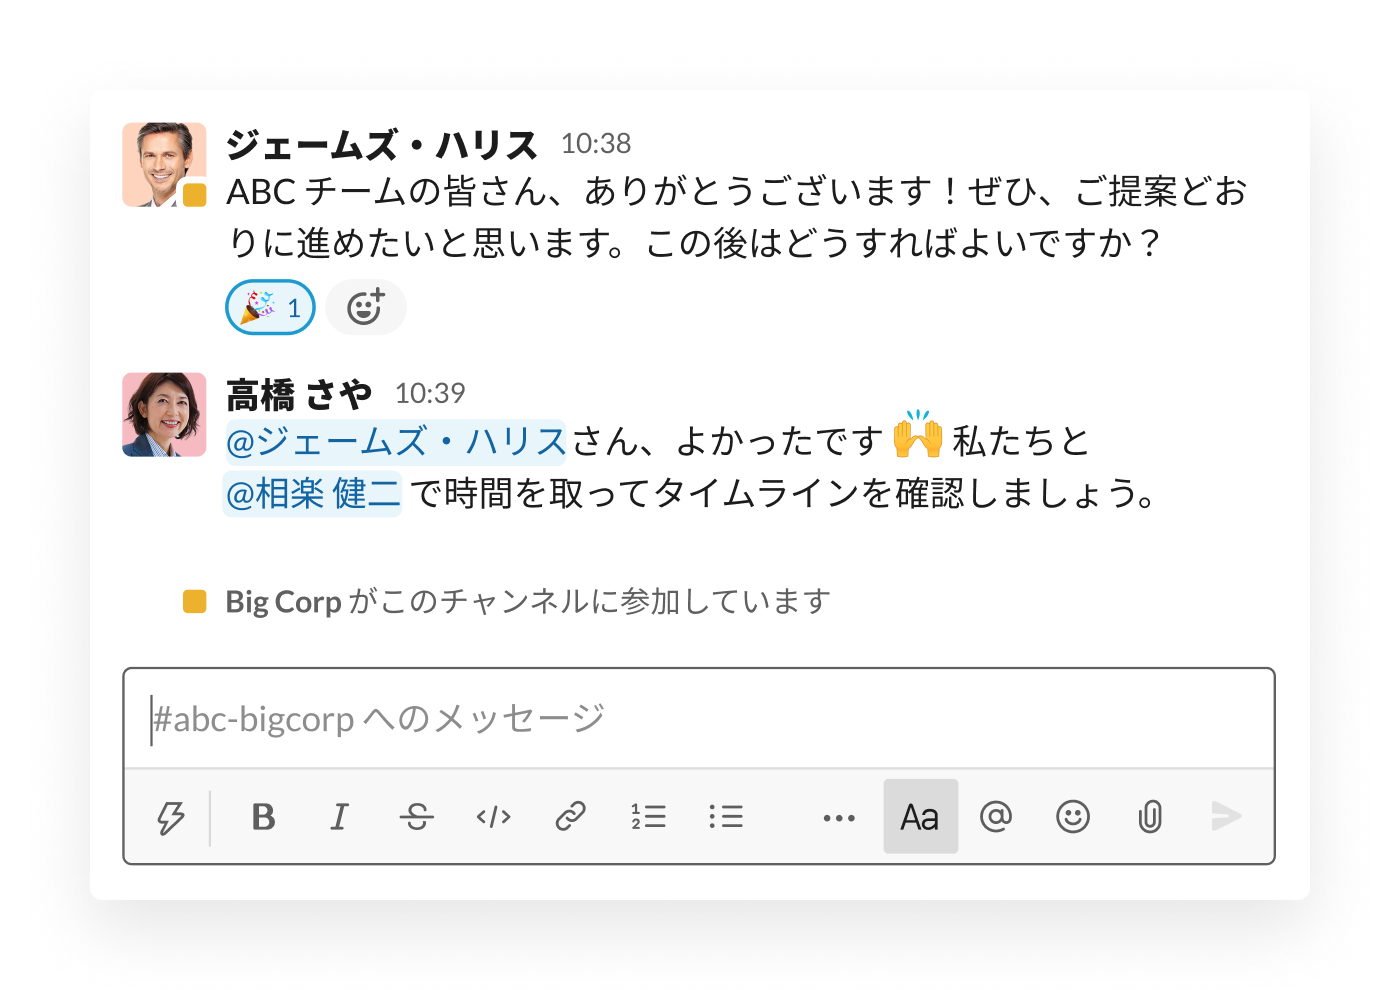 Slack チャンネルで共有された提案を 2 つのオーガナイゼーションで確認して進める